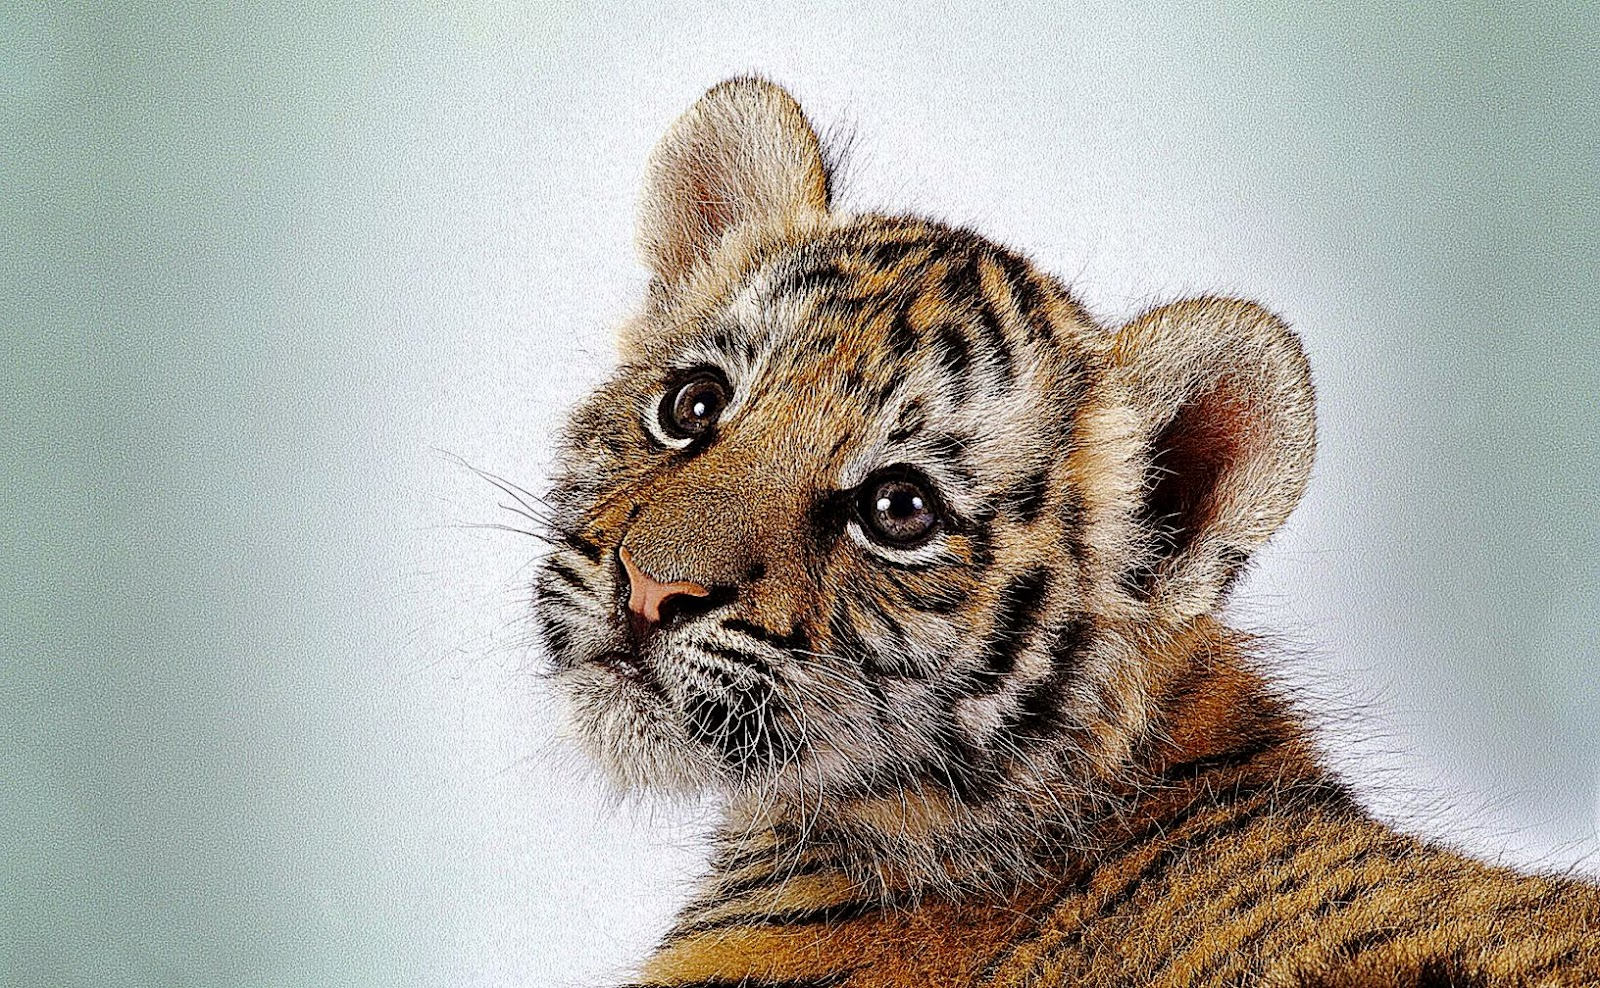 Baby Tiger Wallpaper 11 Backgrounds  Wallruru